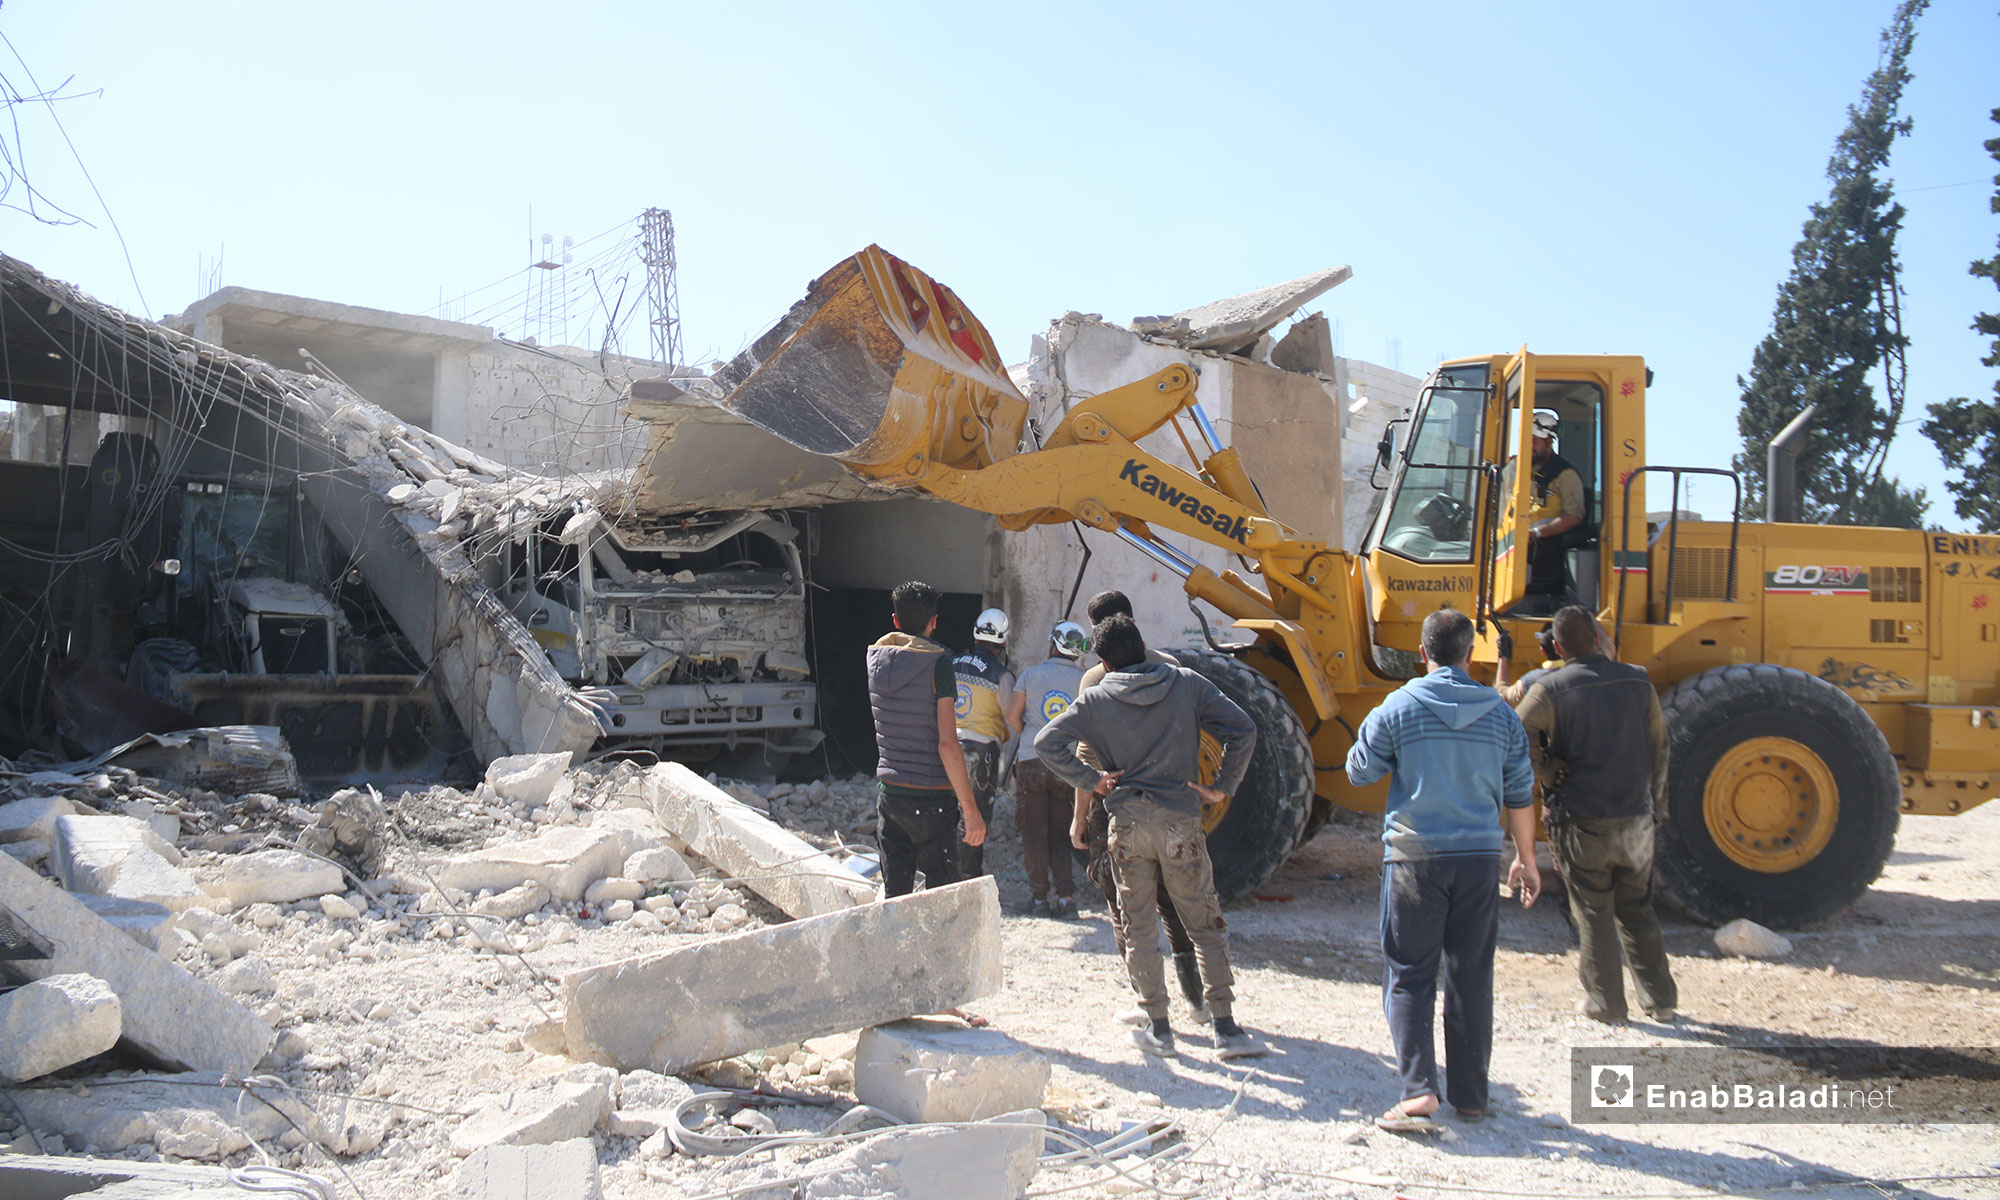 Destruction that befell the Civil Defense Center at the city of Kafr Nabl  - May 13, 2019 (Enab Baladi)